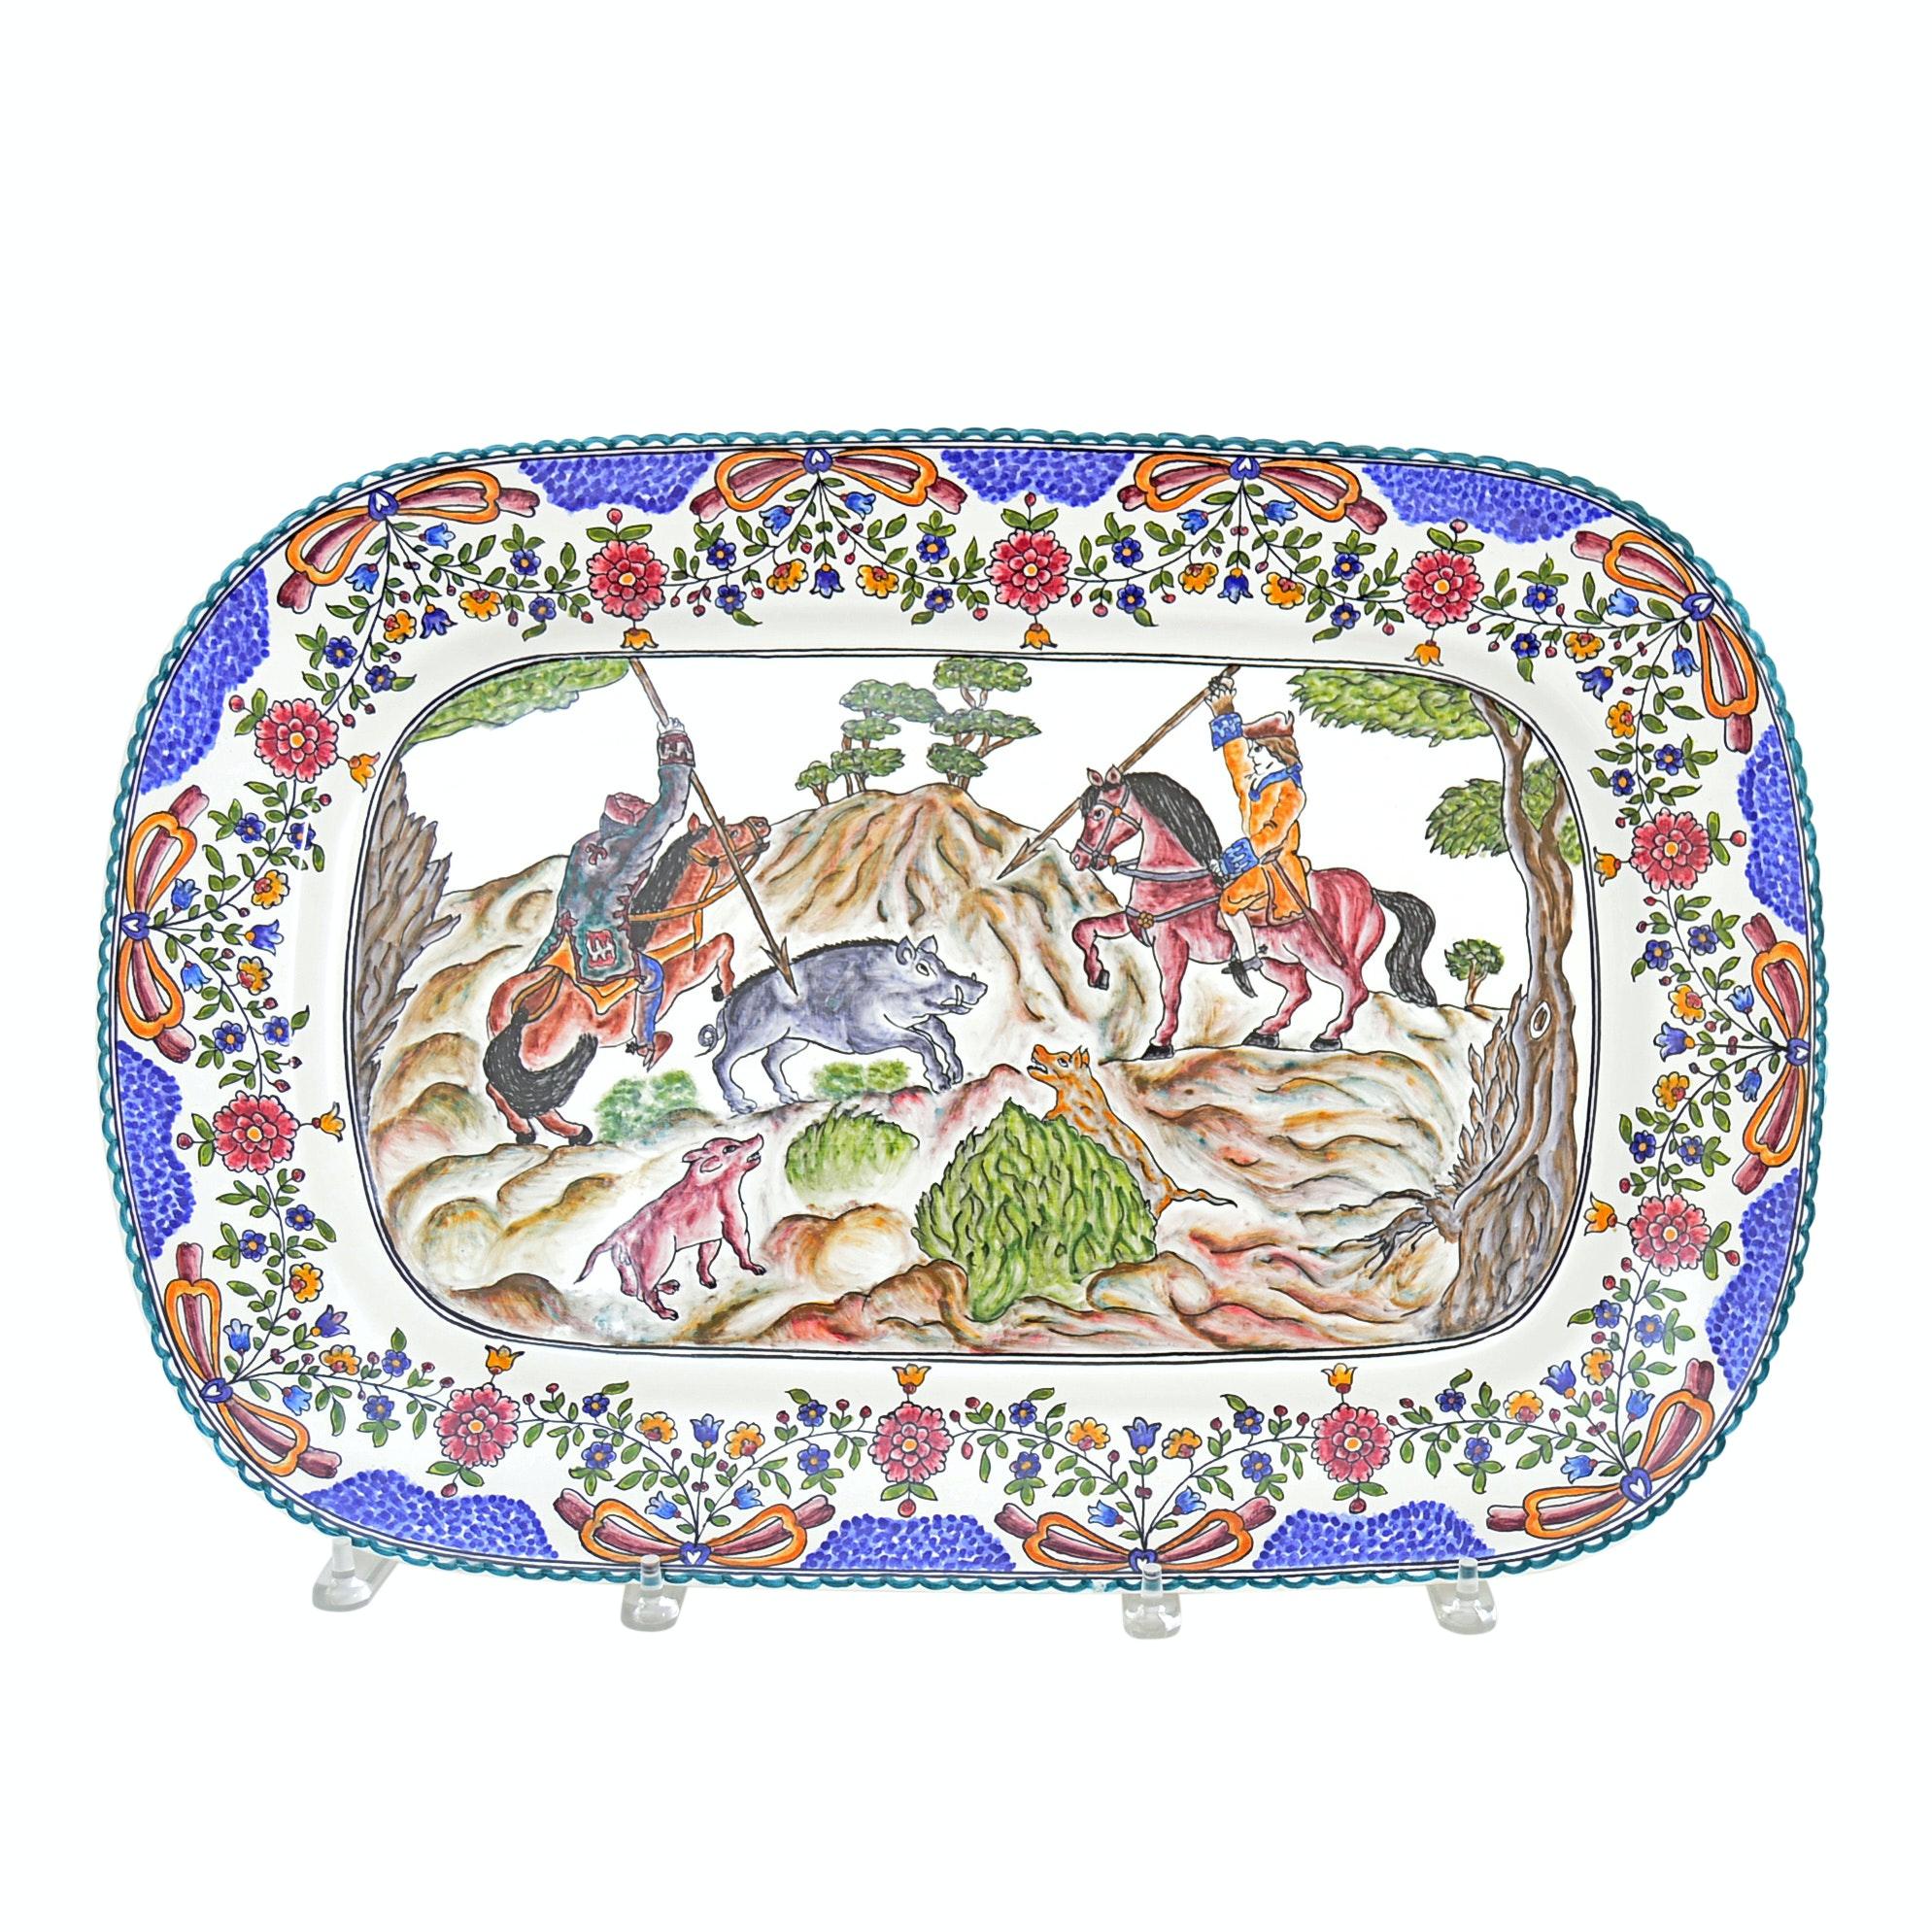 Filcer Portuguese Majolica Pottery Platter